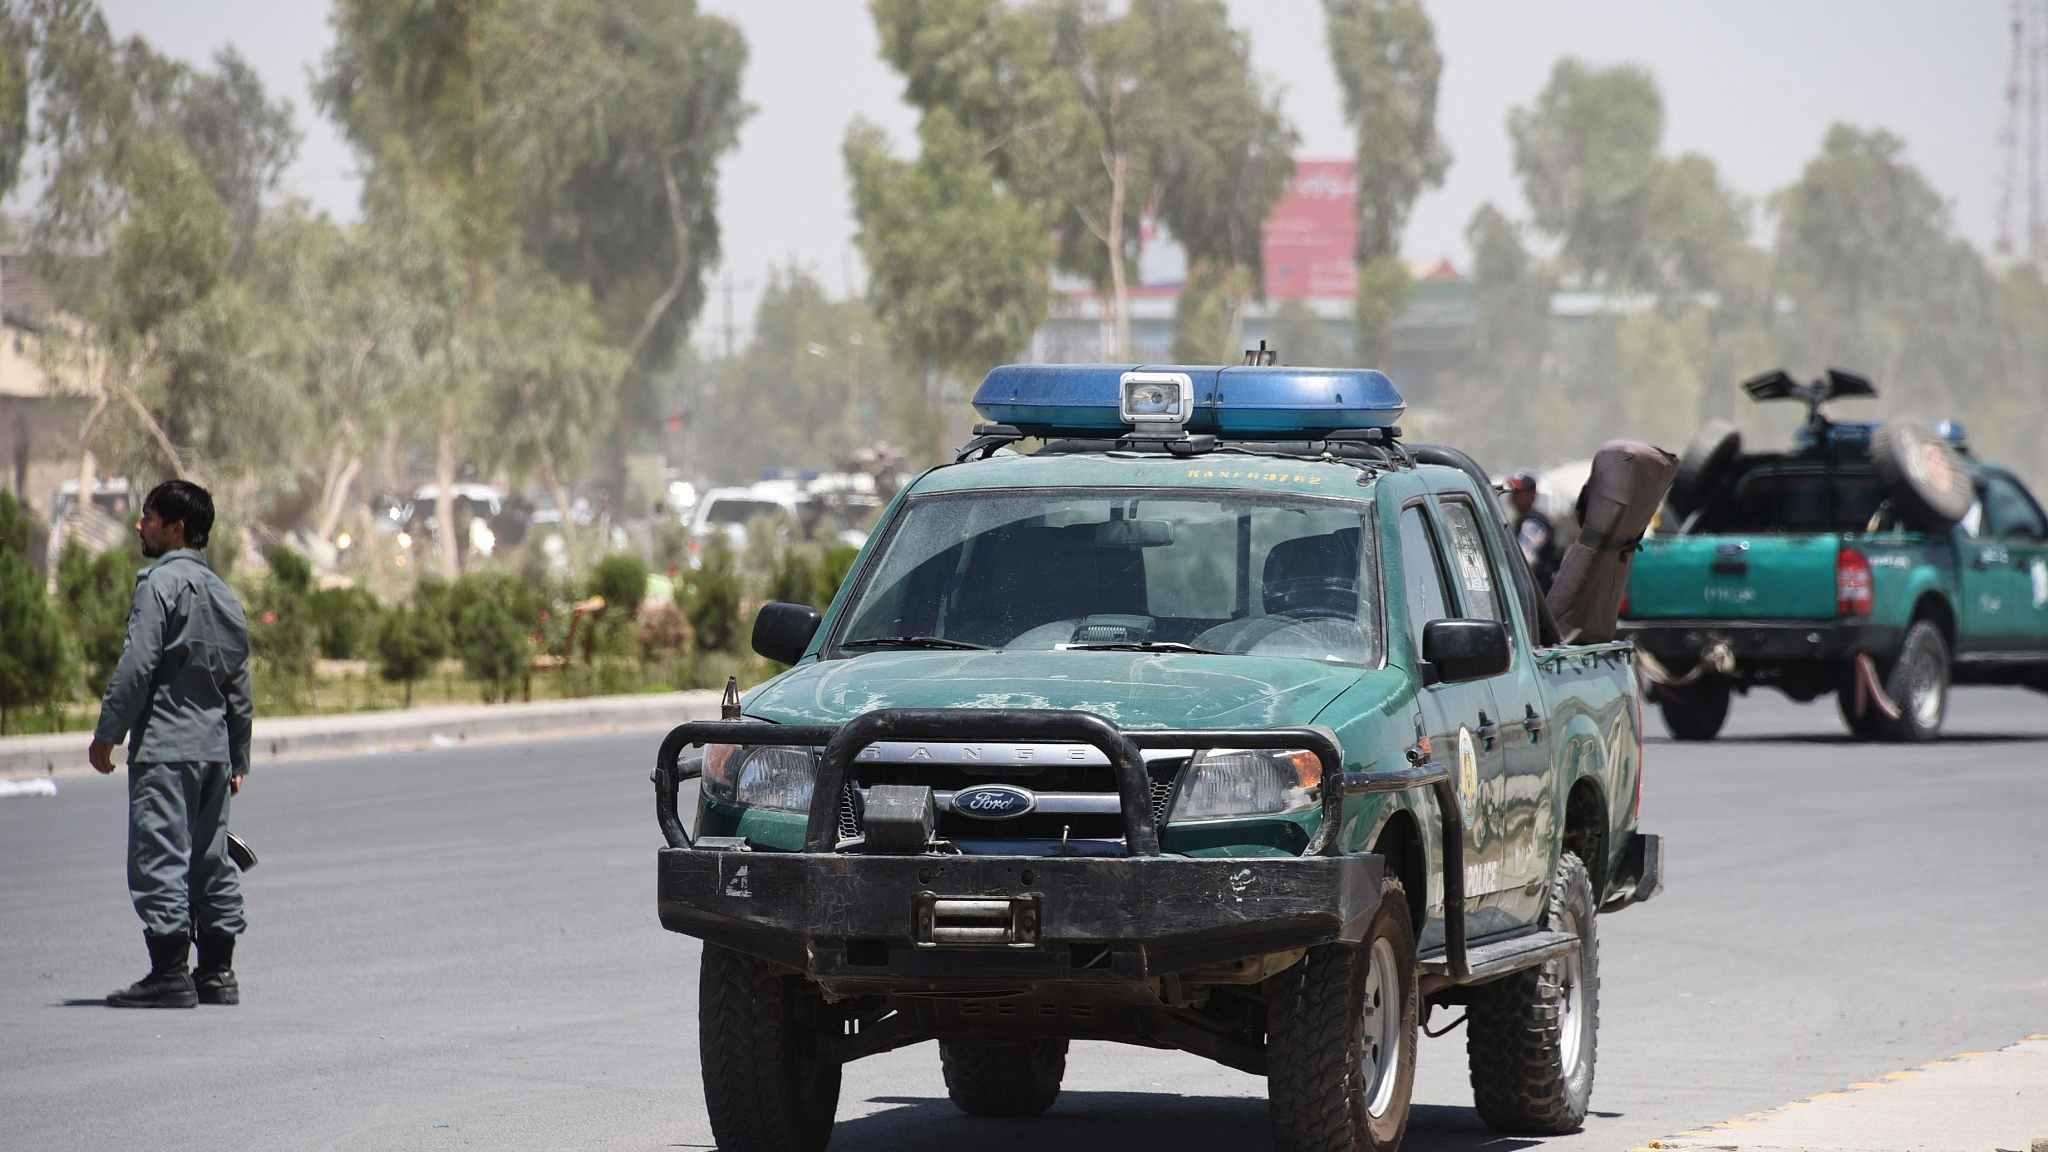 Top Afghan official killed in shooting, US general unhurt